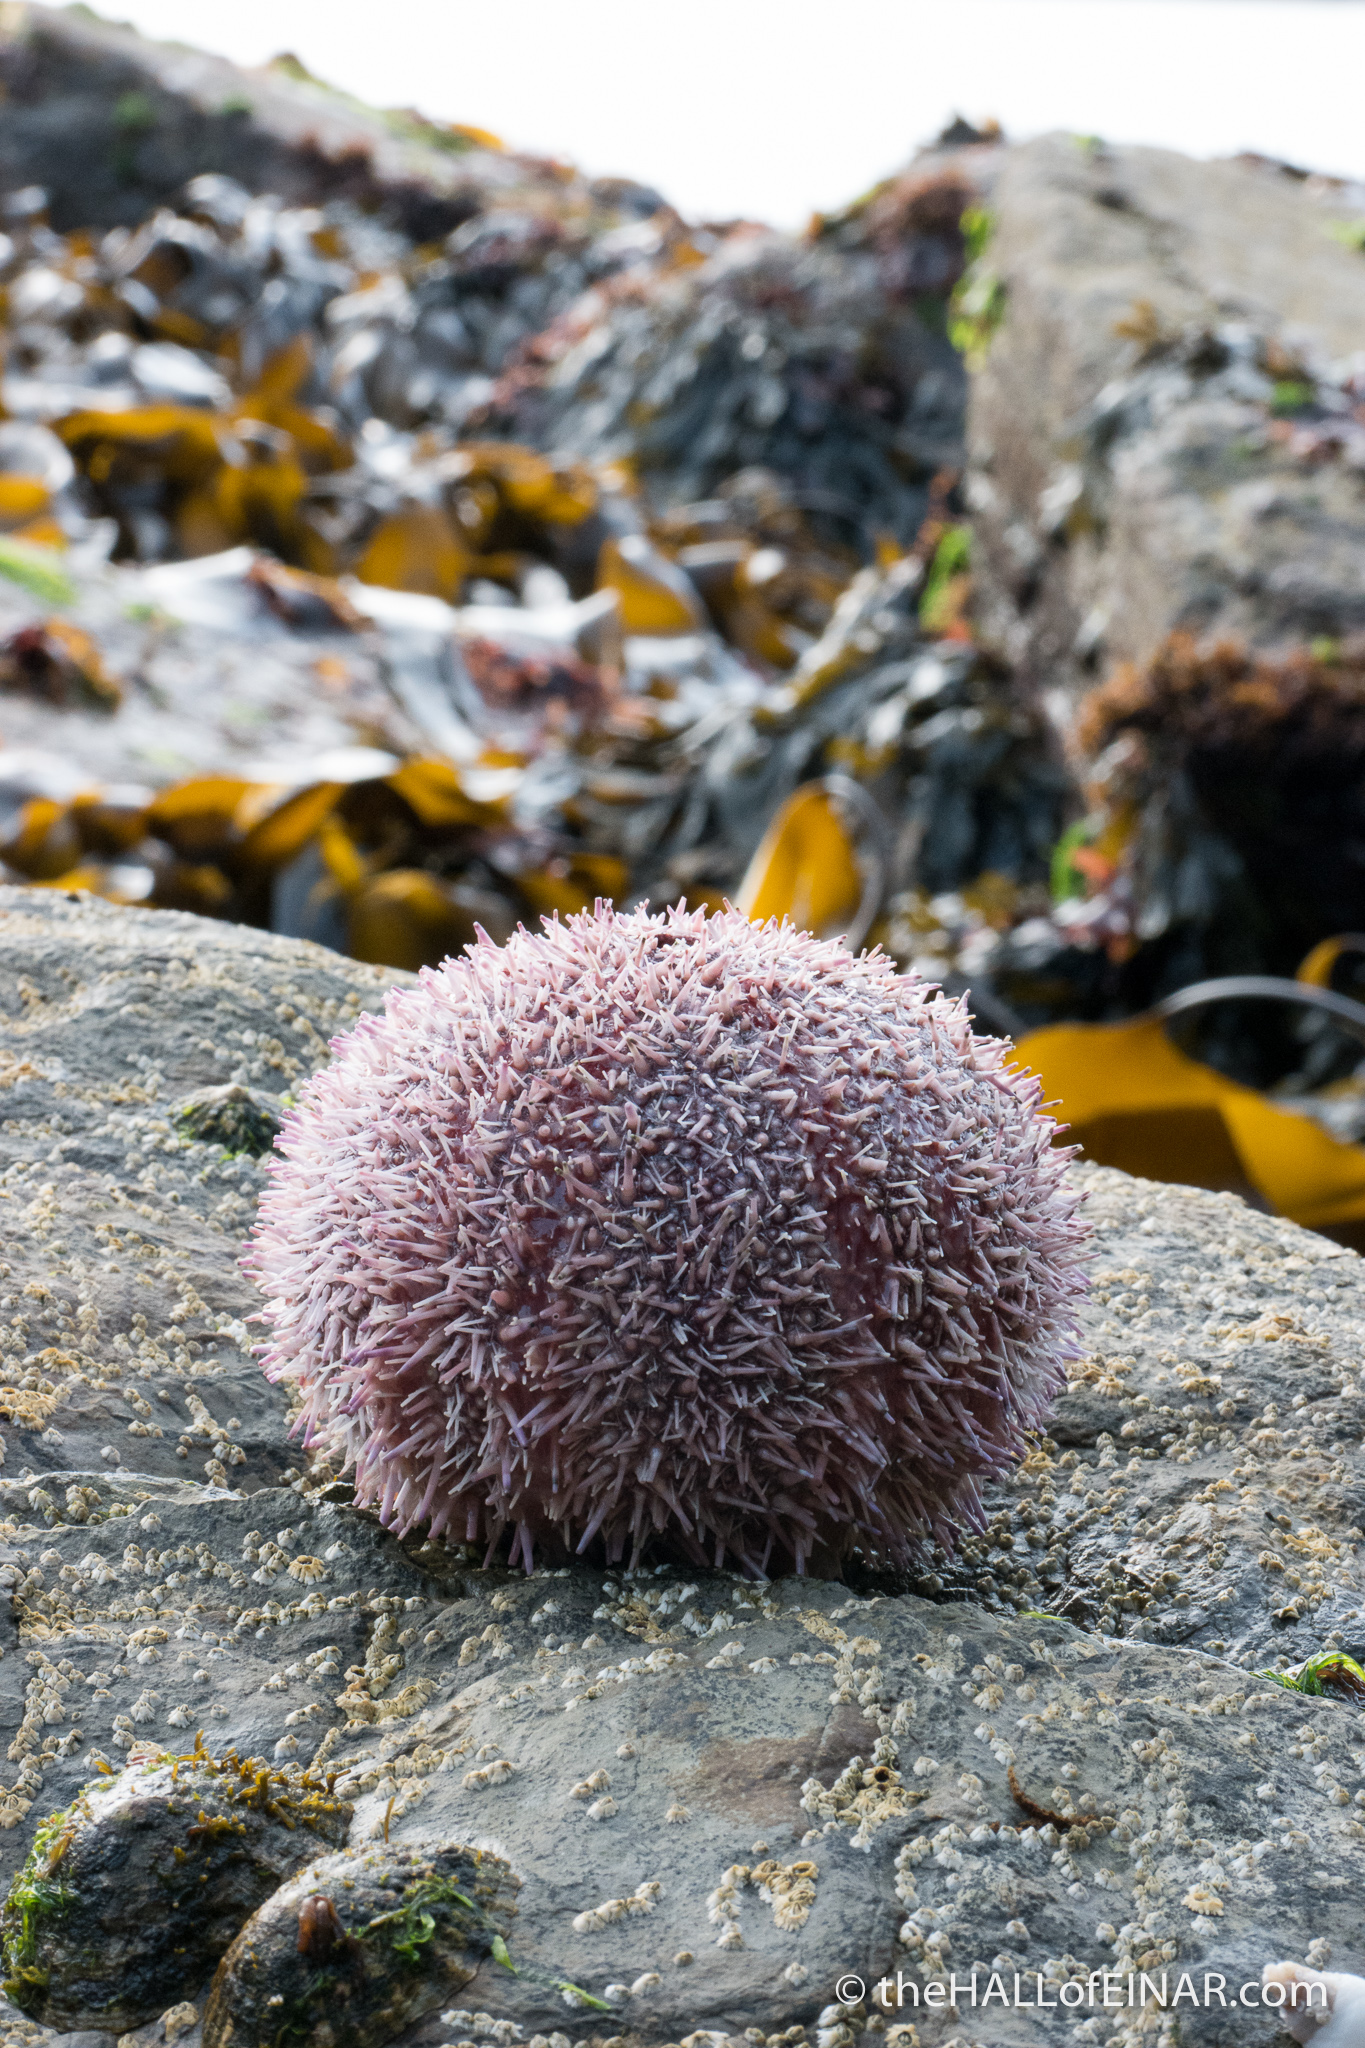 Common Sea Urchin - The Hall of Einar - photograph (c) 2016 David Bailey (not the)